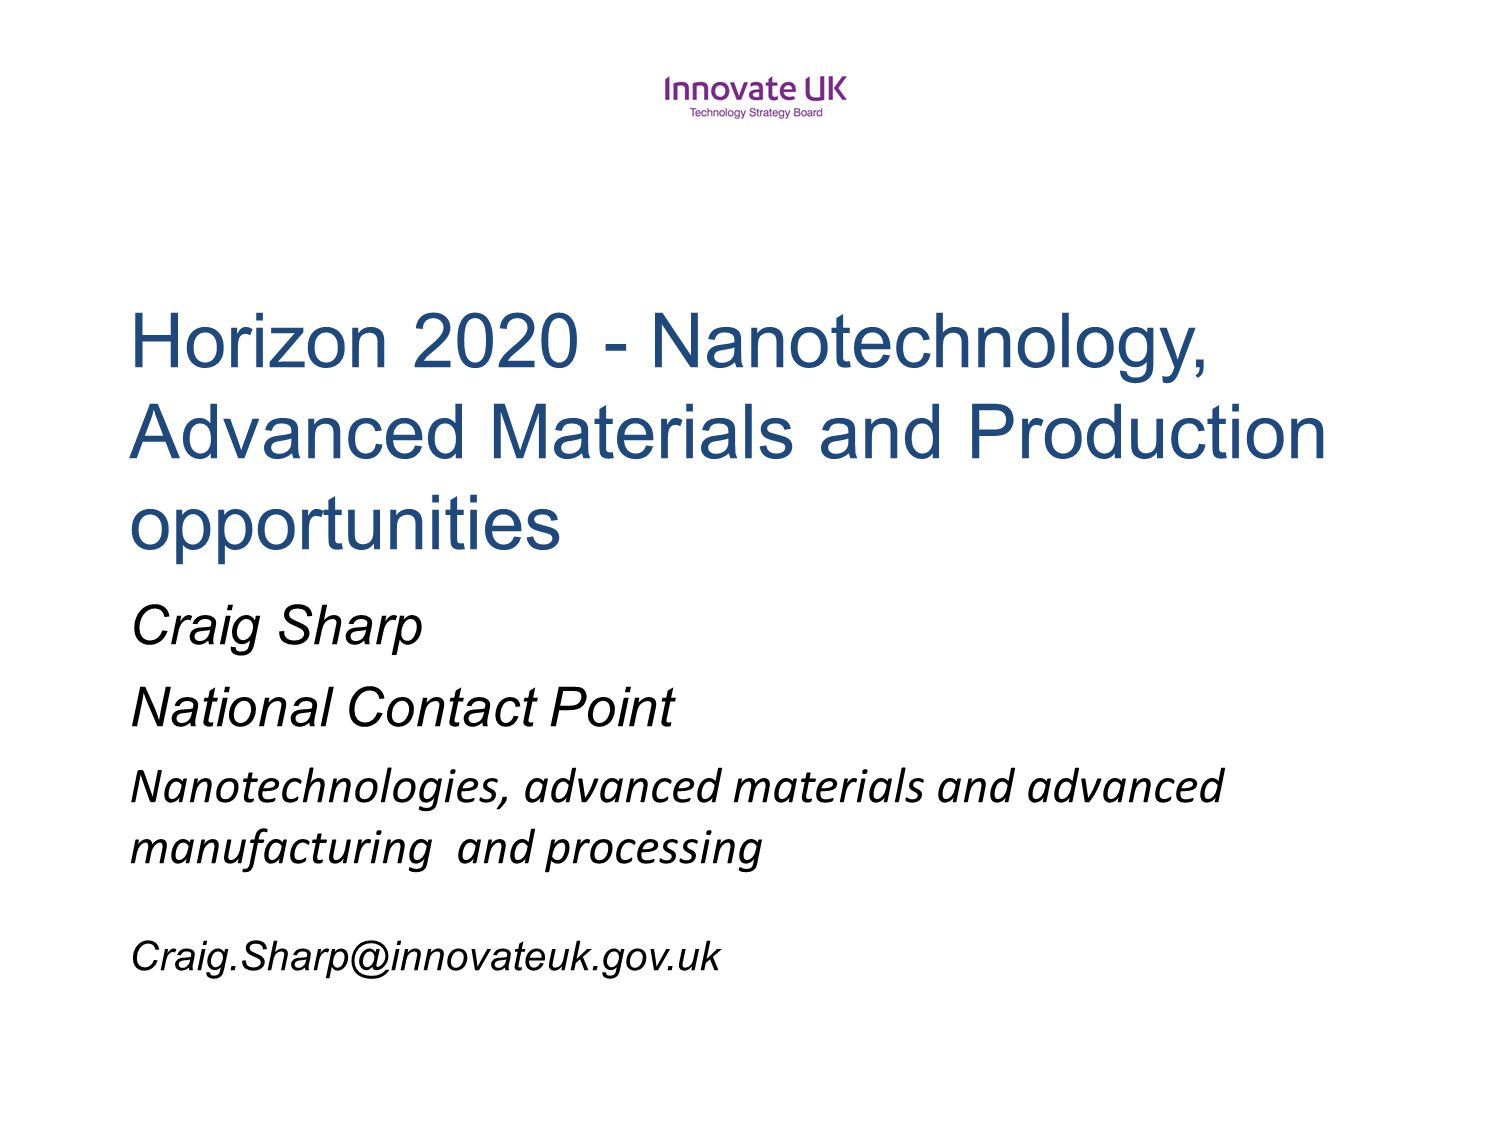 H2020UK Horizon 2020 - Nanotechnology, Advanced Materials and Production opportunities. Craig Sharp.